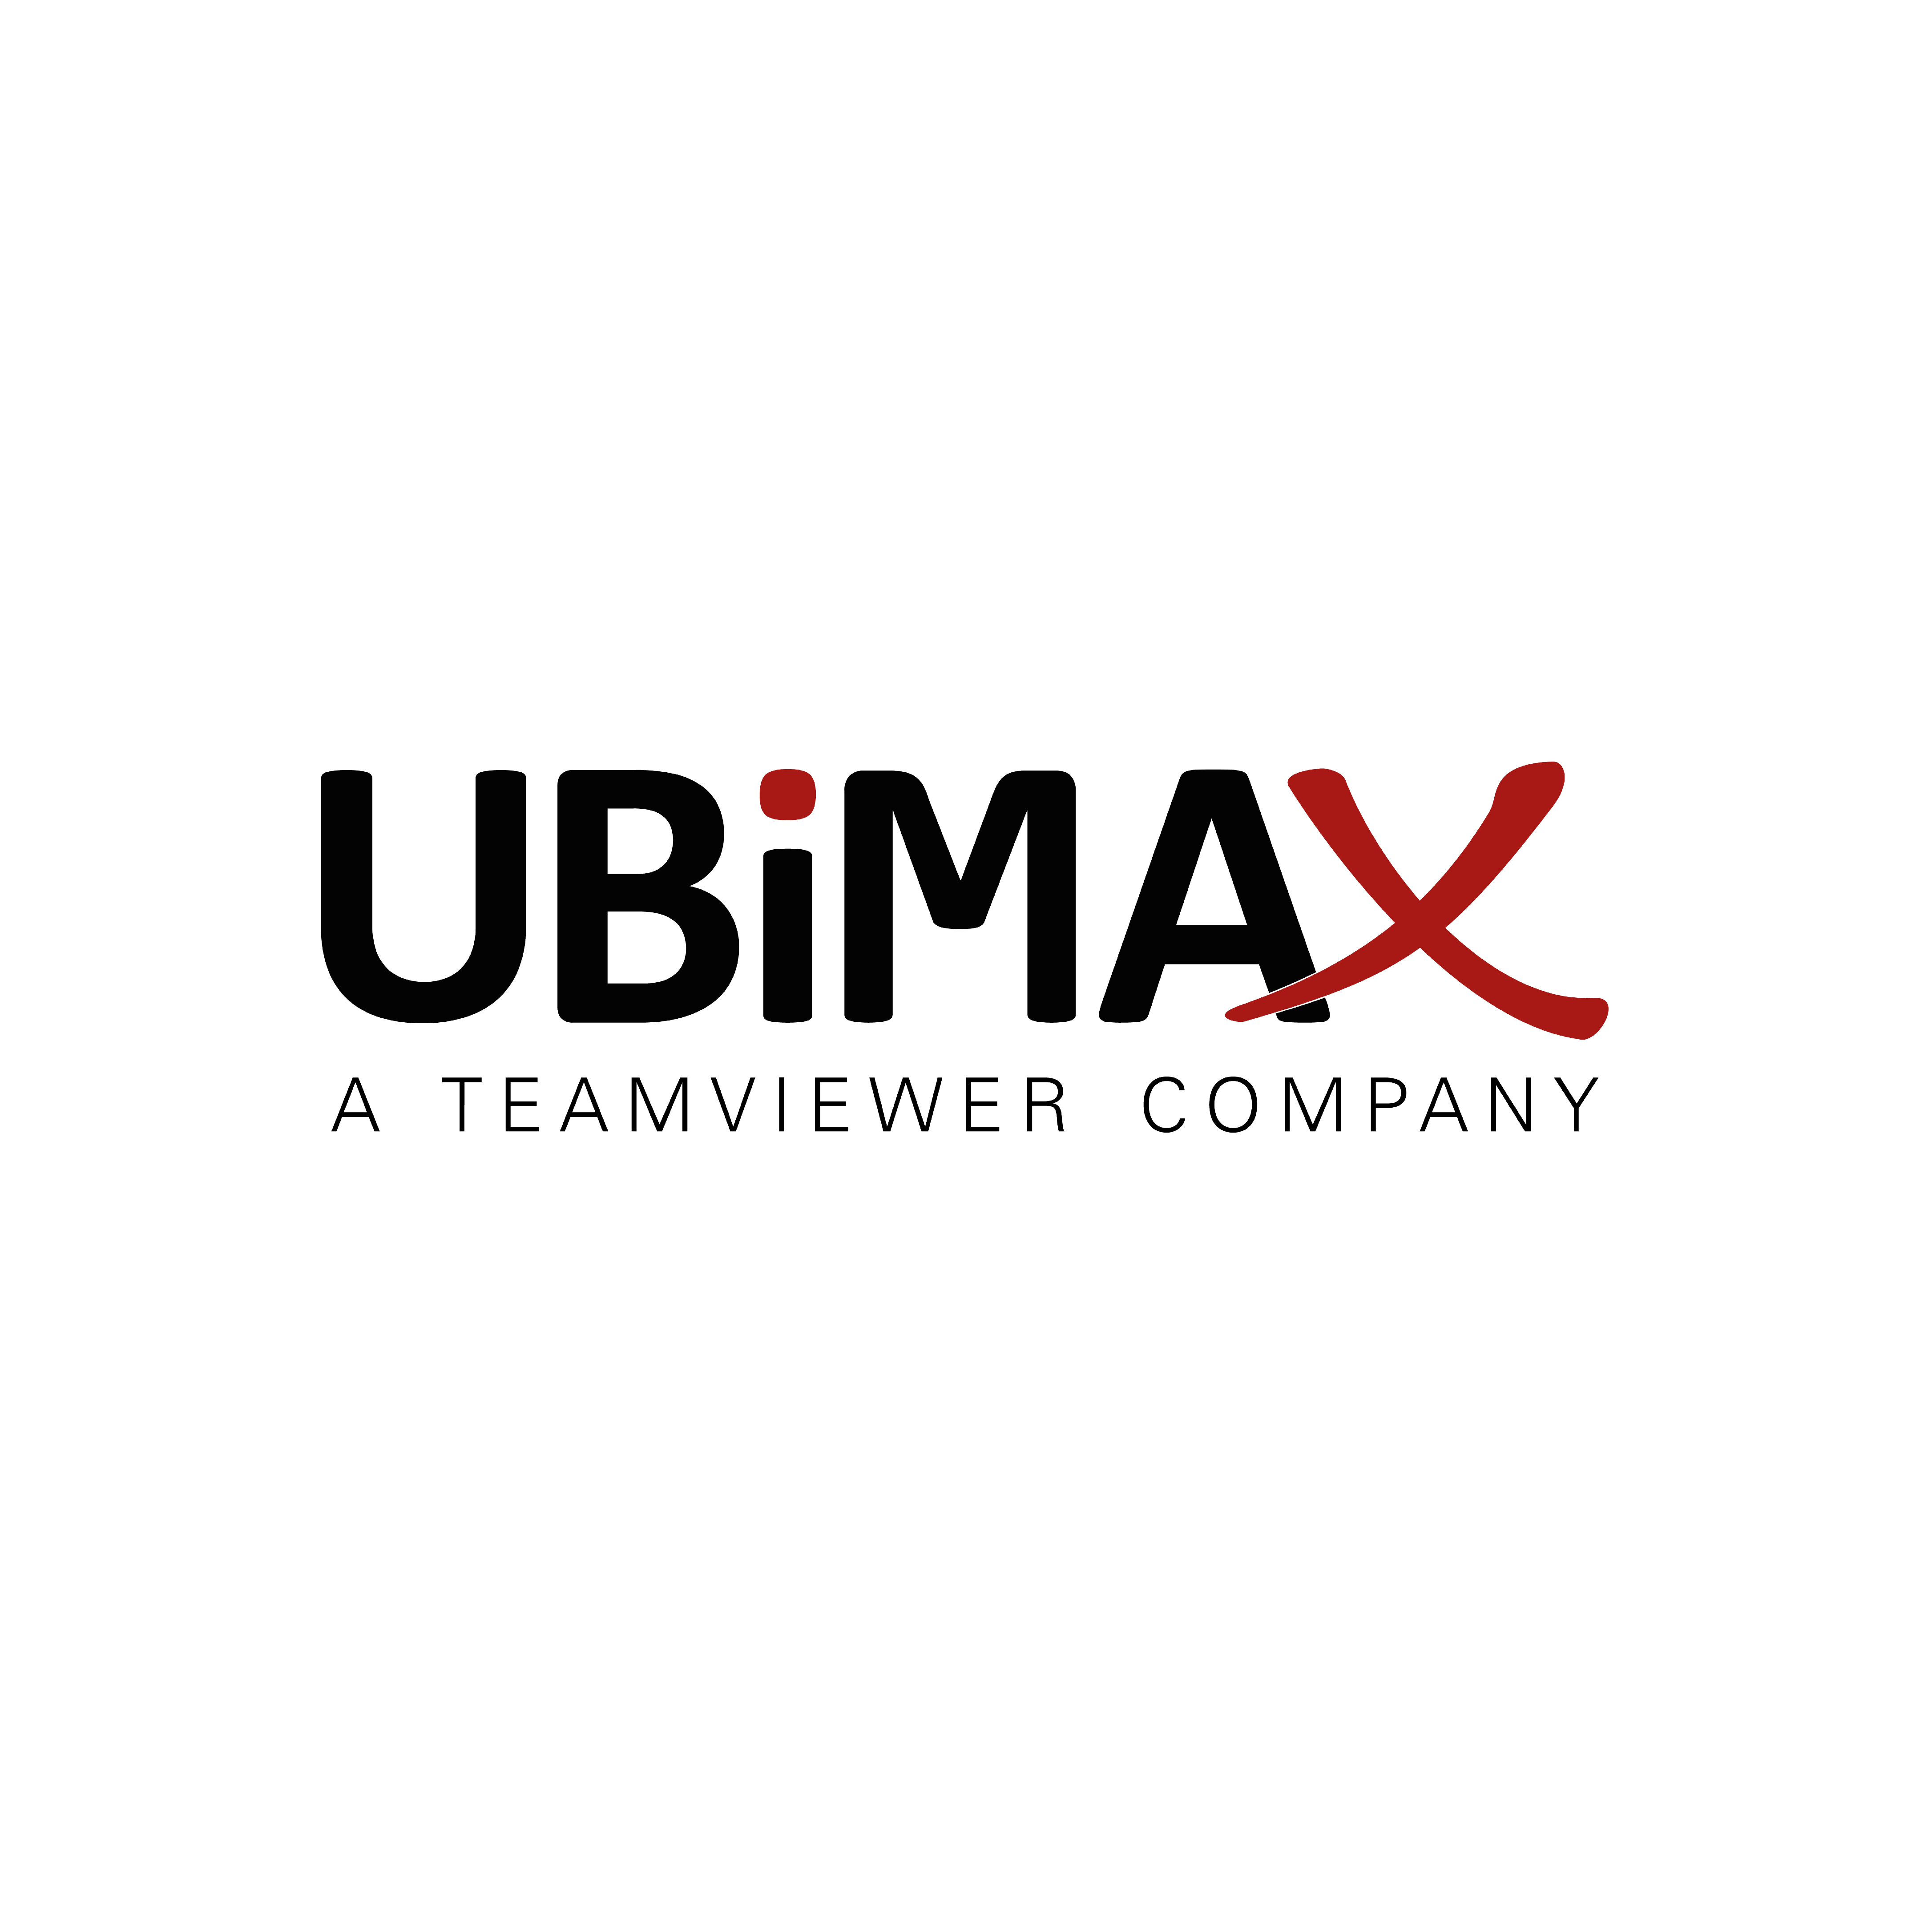 Ubimax - A Team Viewer Company